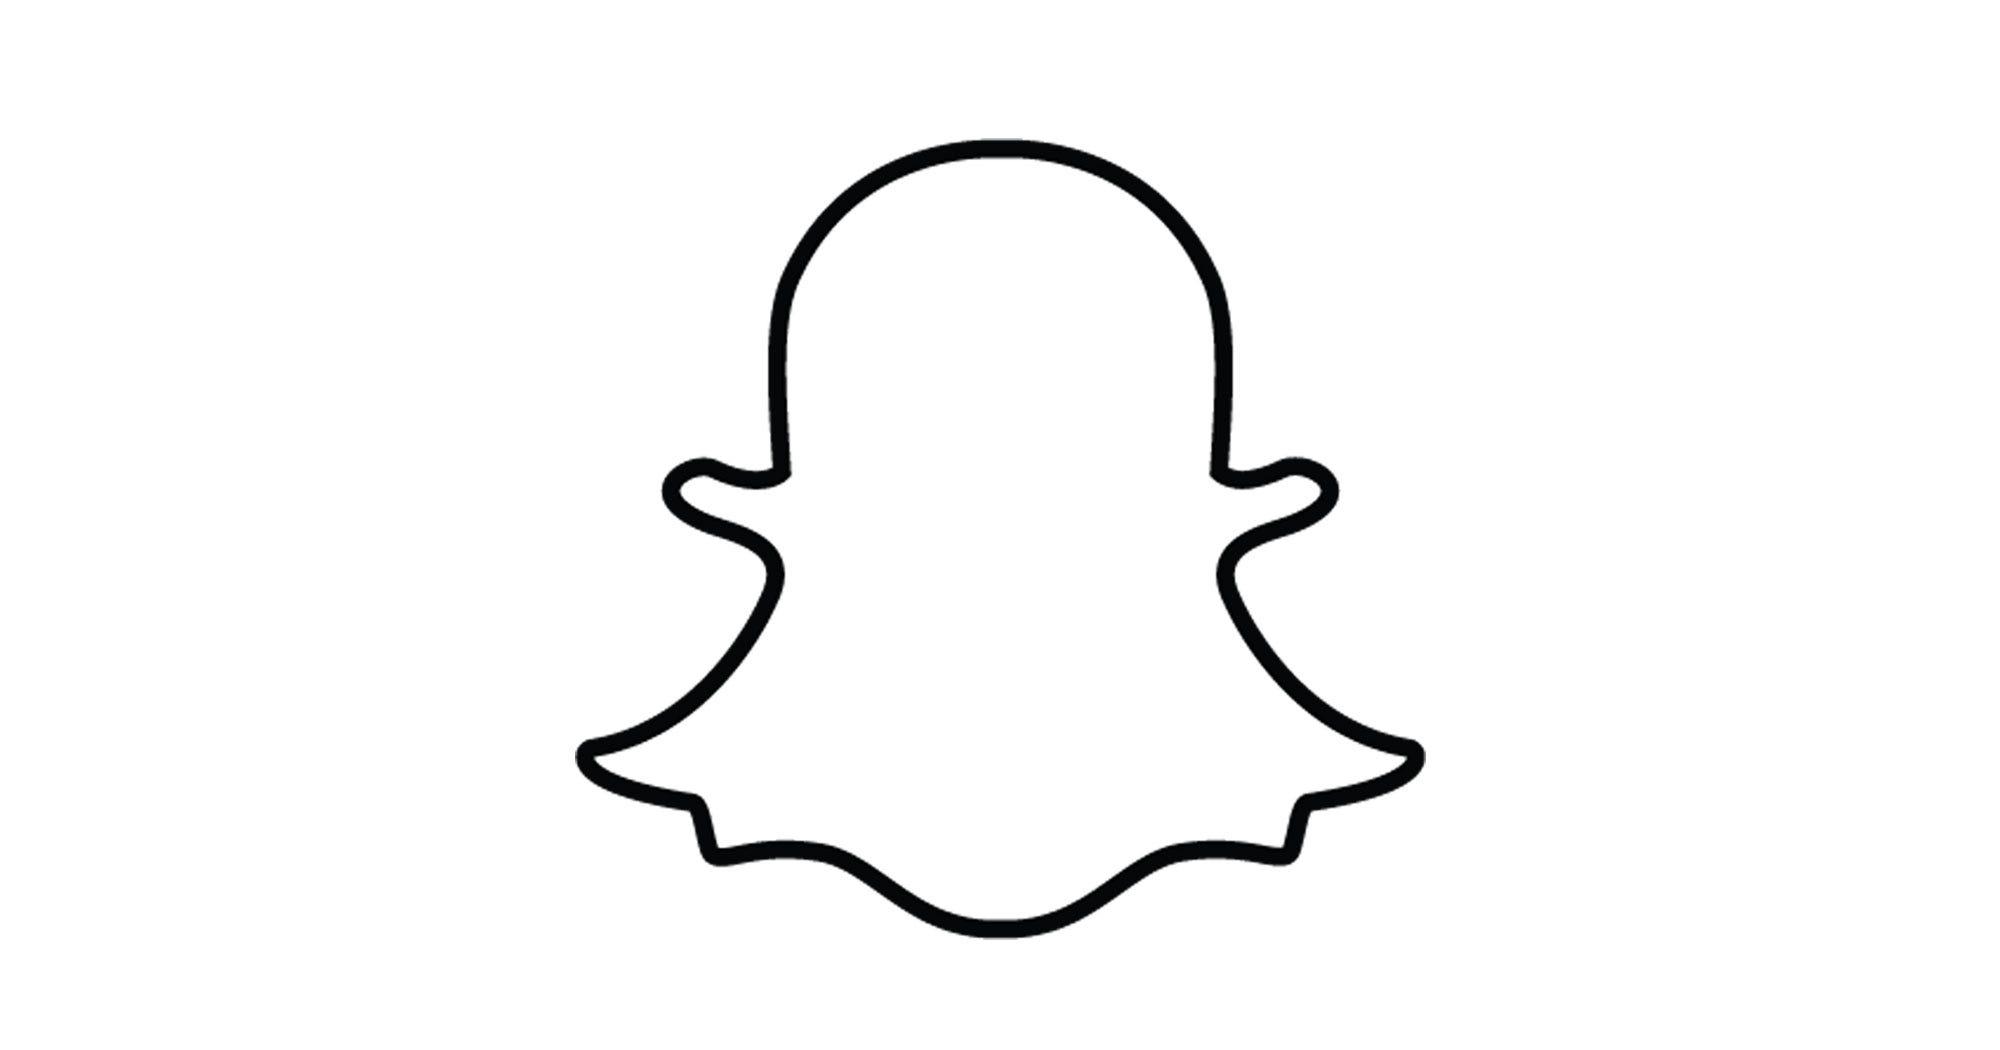 snapchat filters app features secret hacks